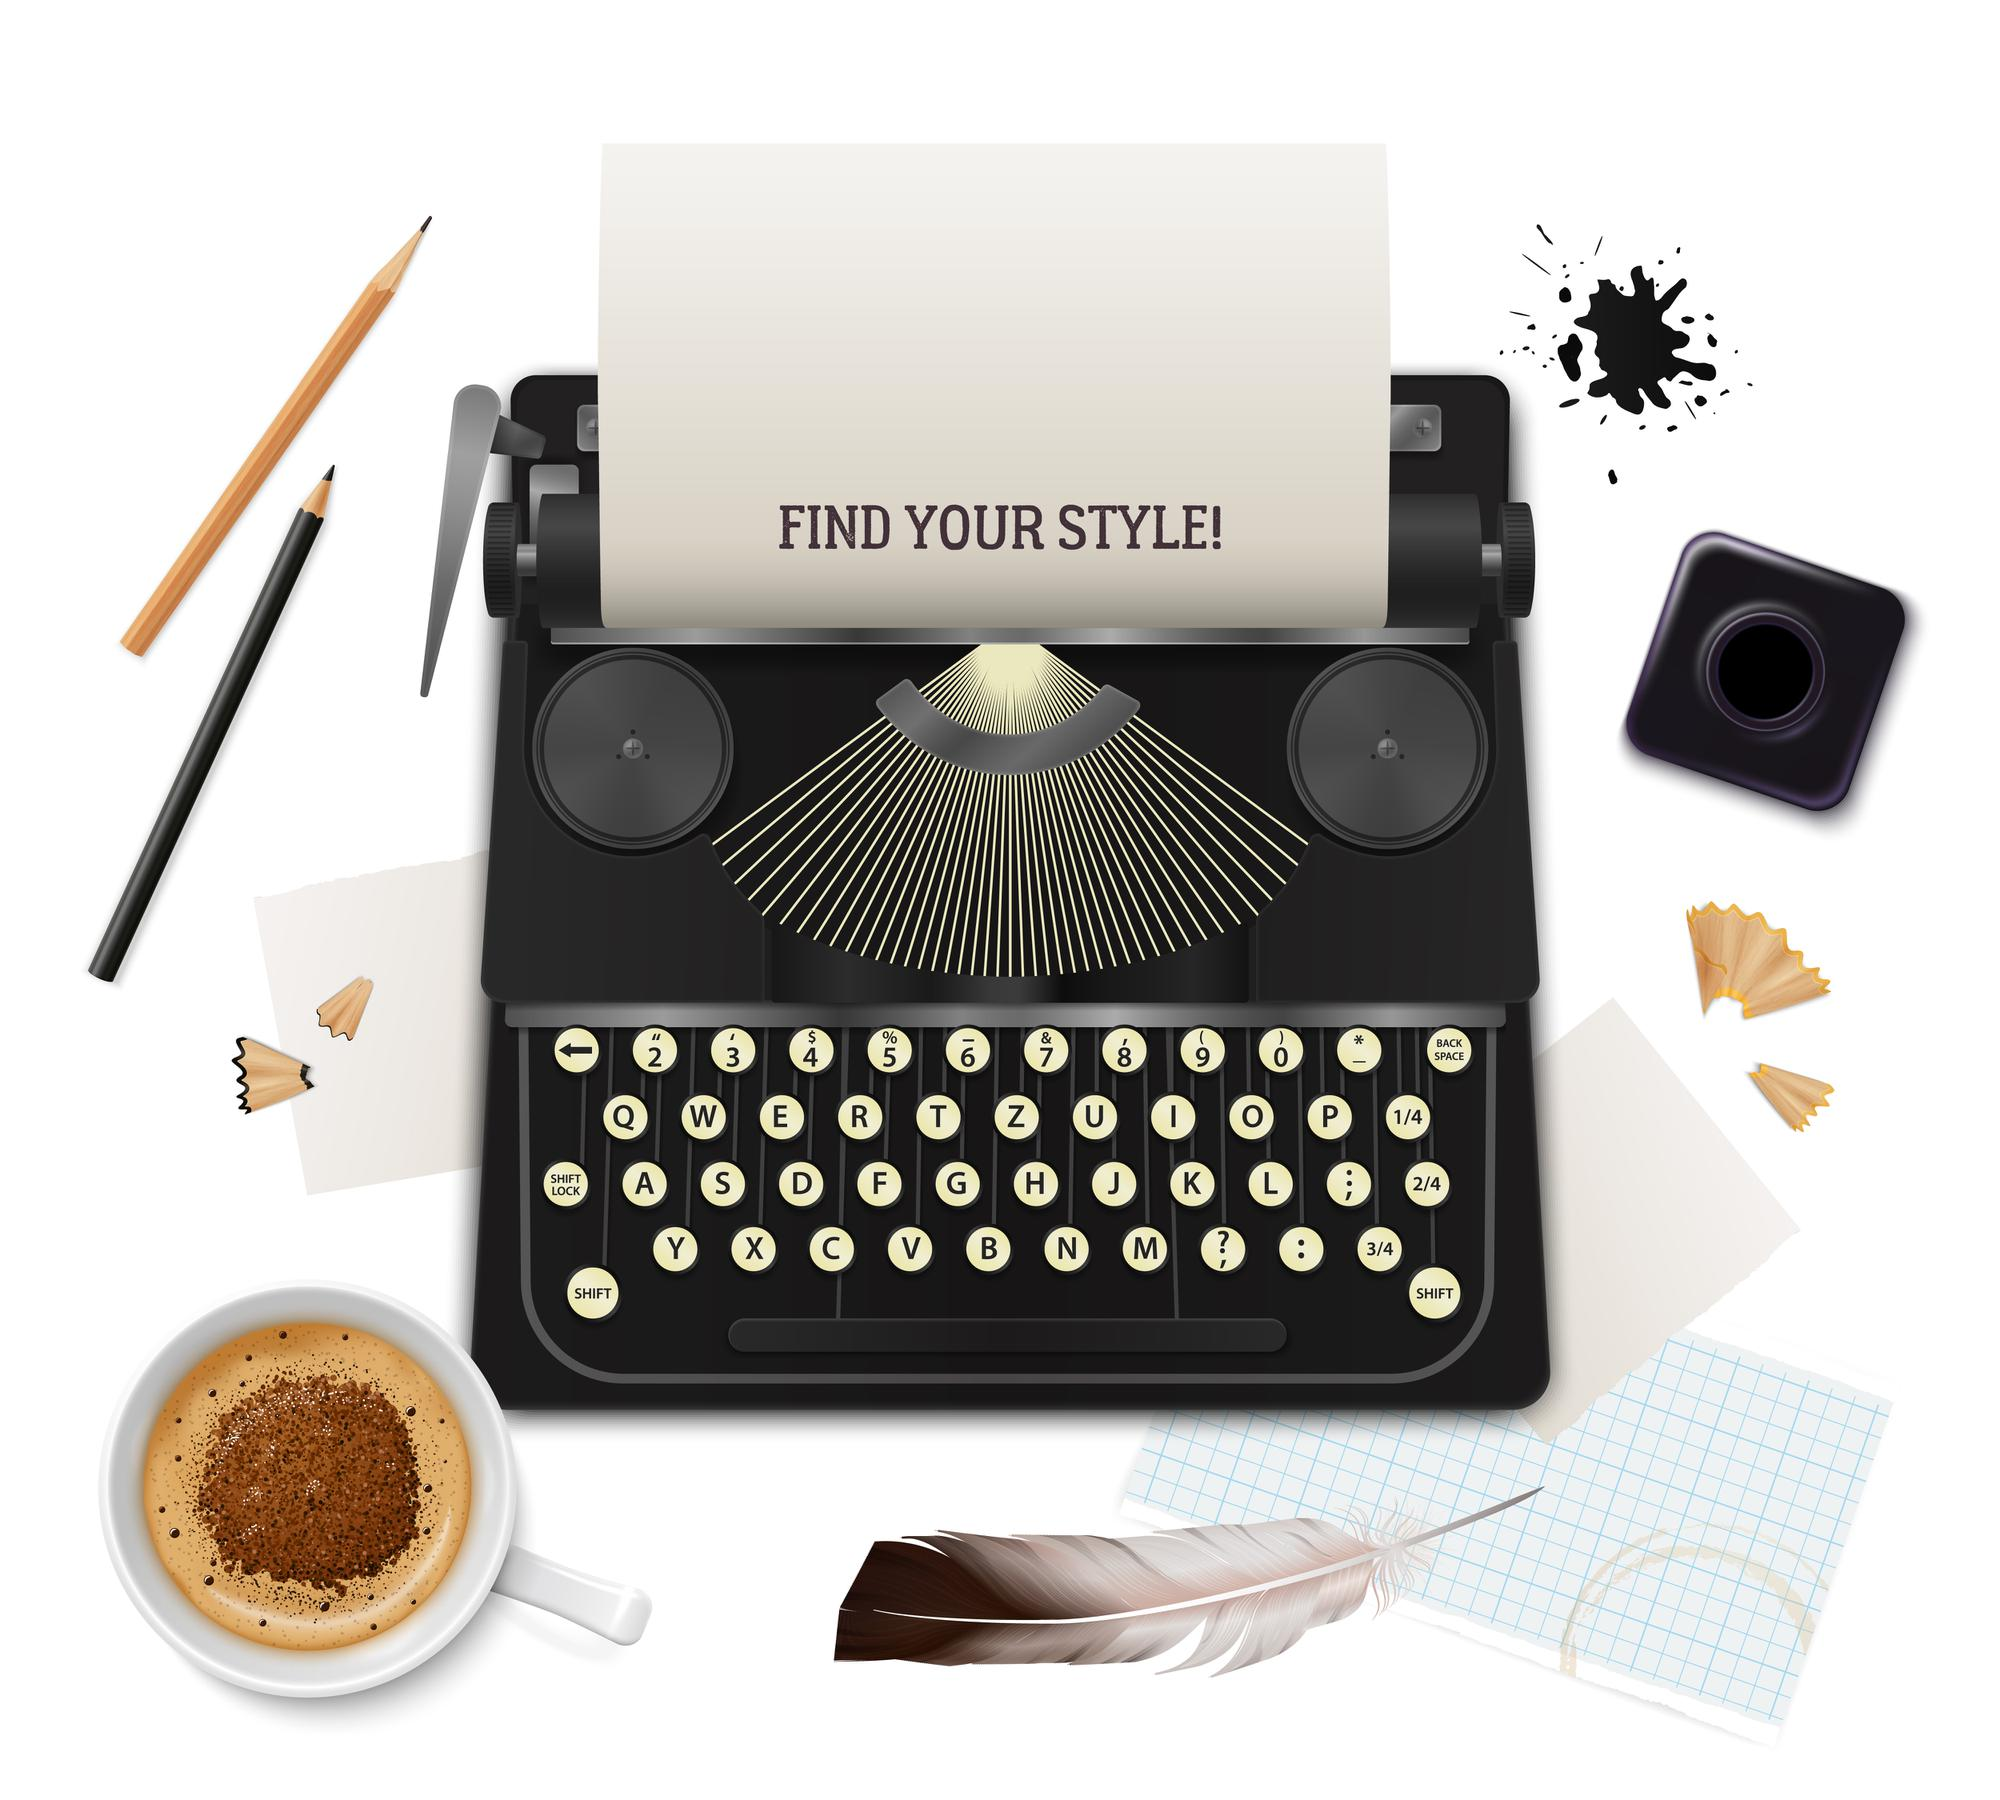 Tuangkan Ide Brilianmu dalam Novel Fiksi Ilmiah, Penelitian Dibalut Sastra